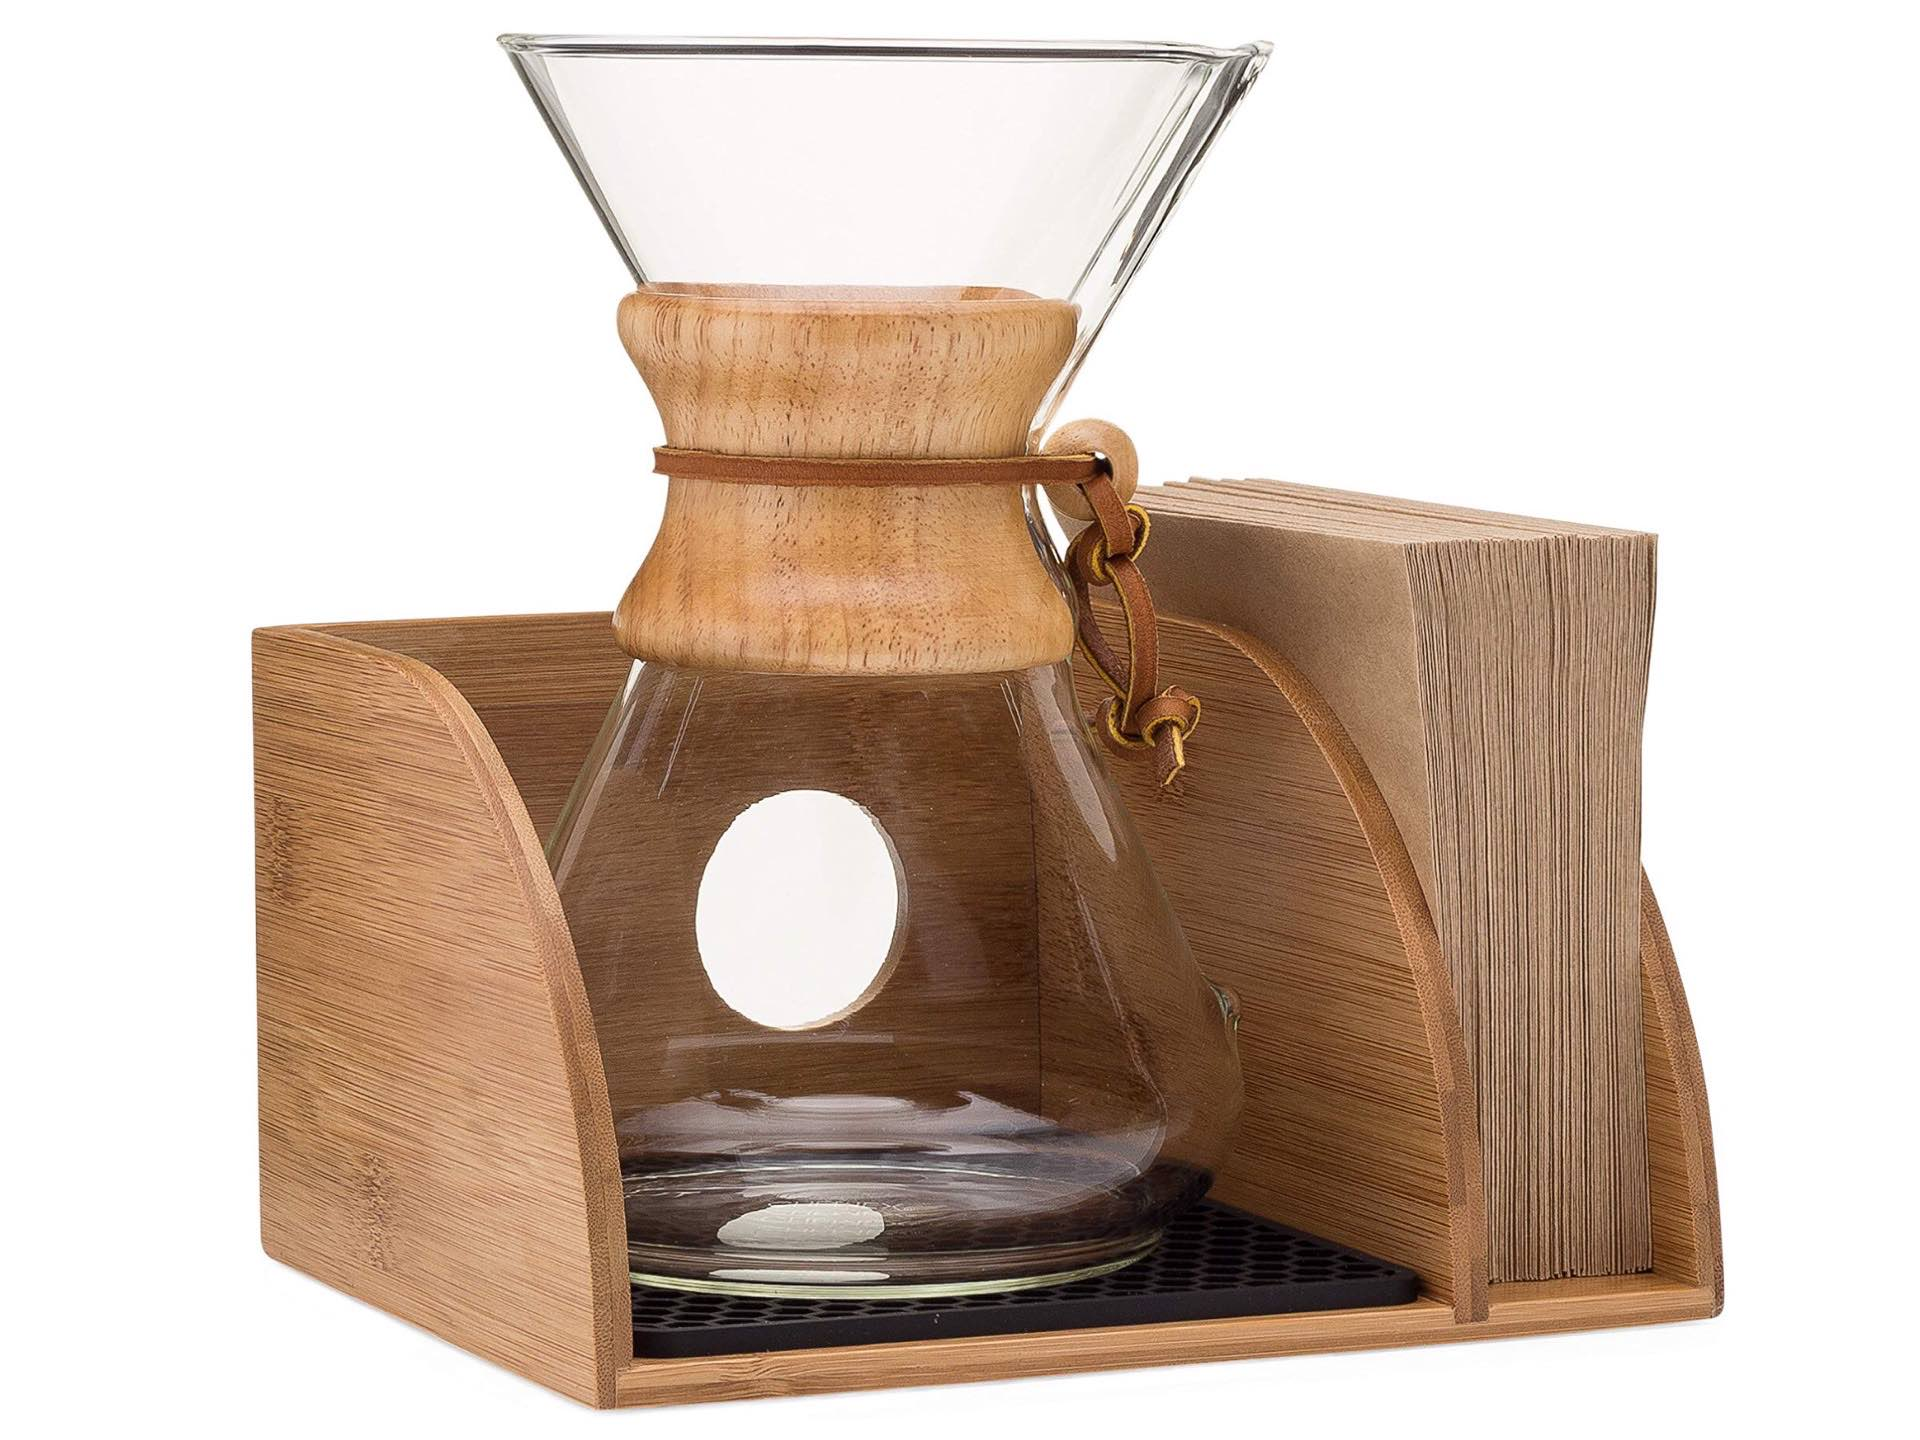 chemex-coffee-maker-organizer-by-drip-and-brew-coffee-company